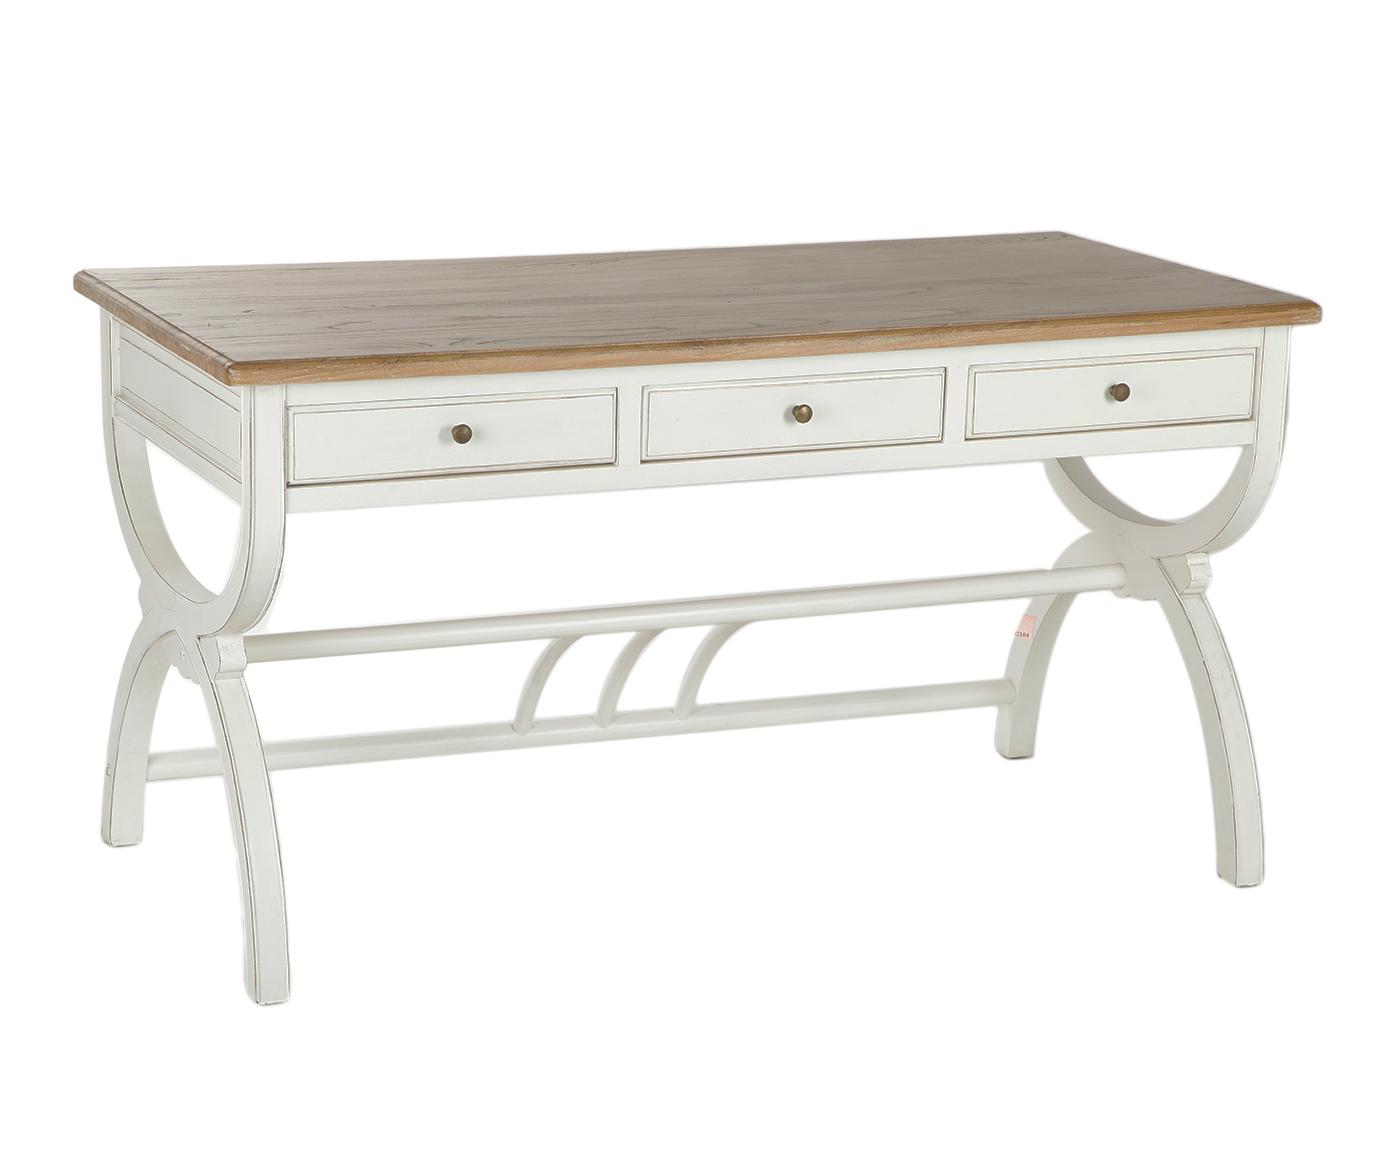 Стол письменныйПисьменные столы<br><br><br>Material: Бук<br>Width см: 150<br>Depth см: 70<br>Height см: 82